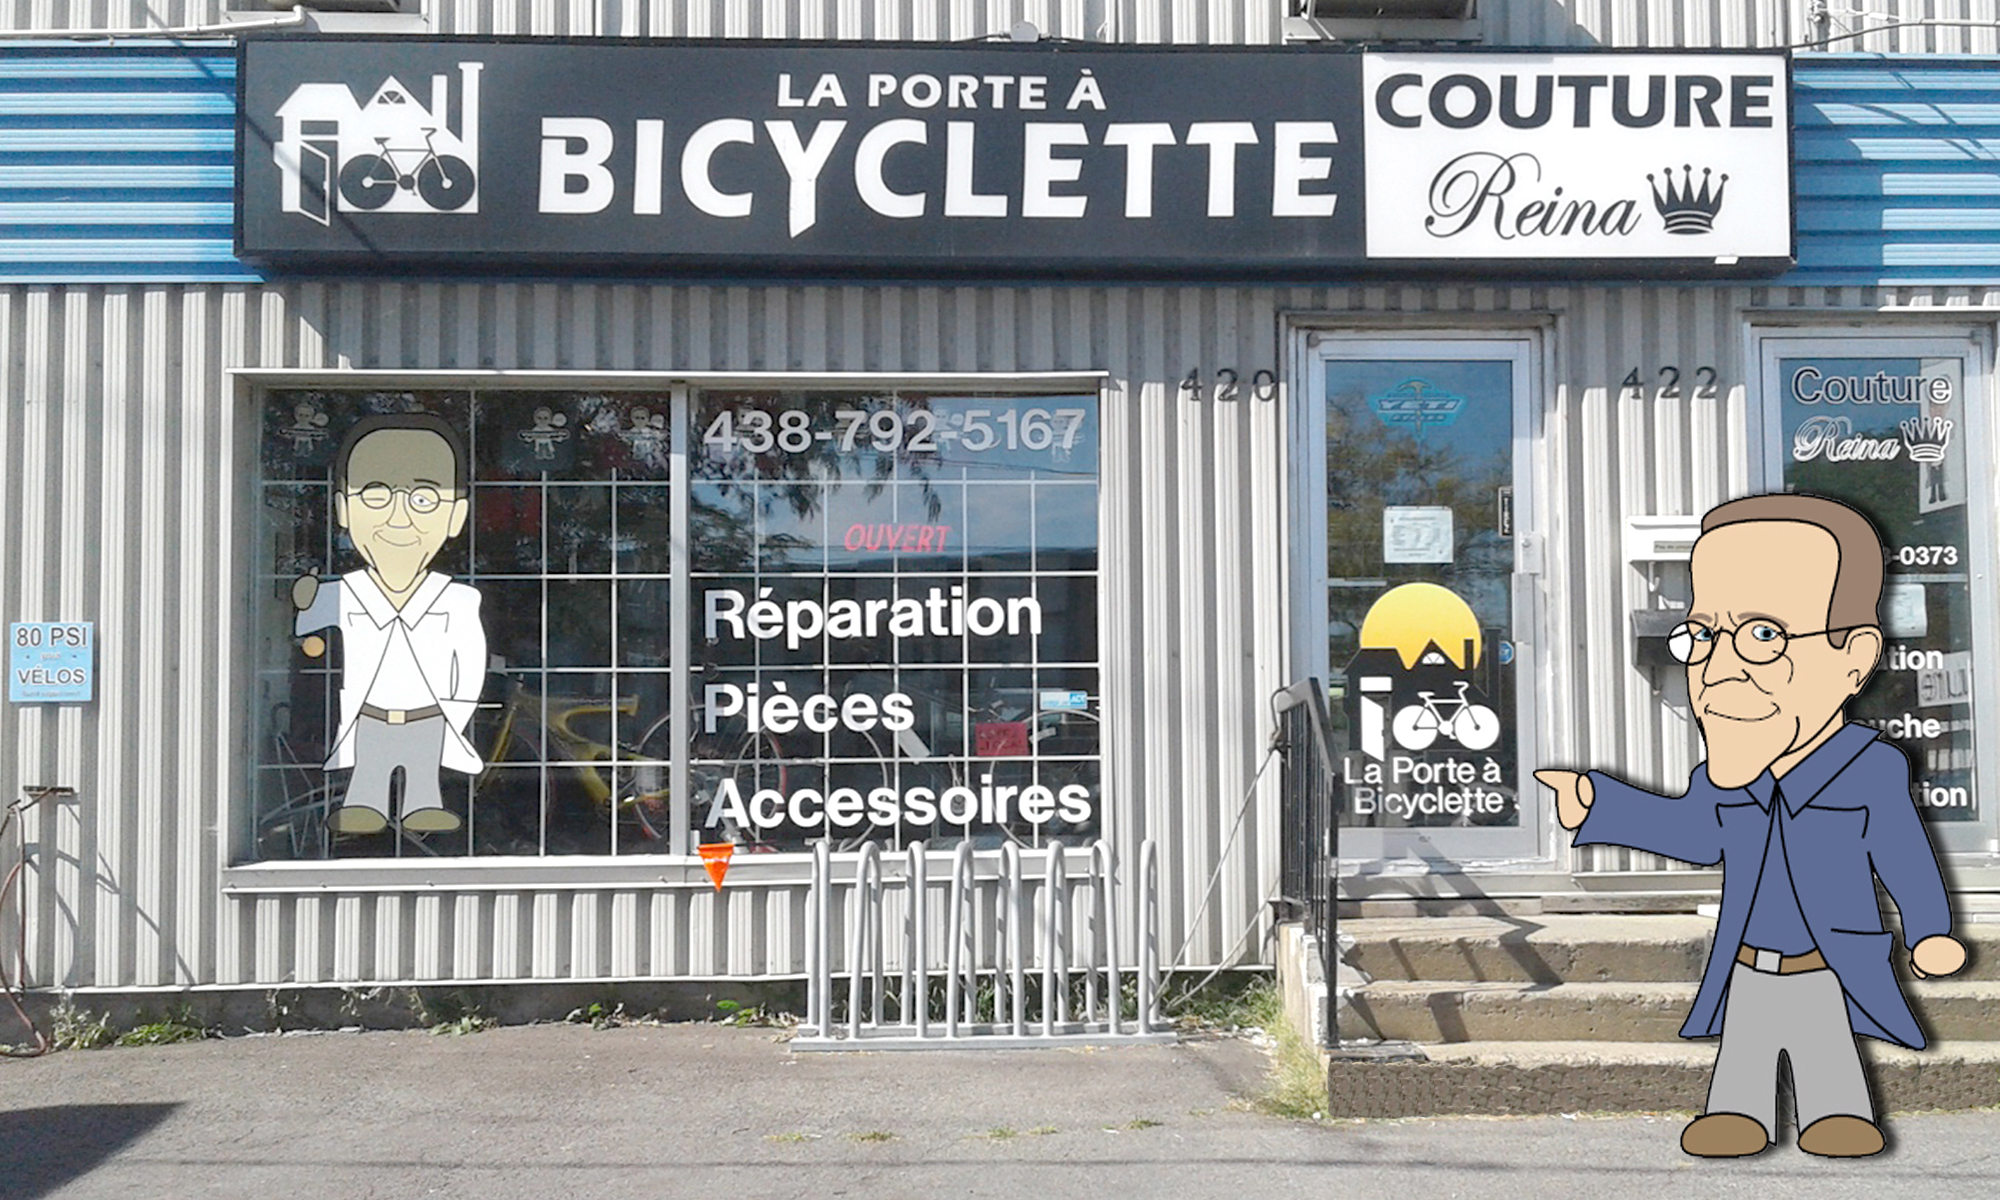 La Porte a bicyclette